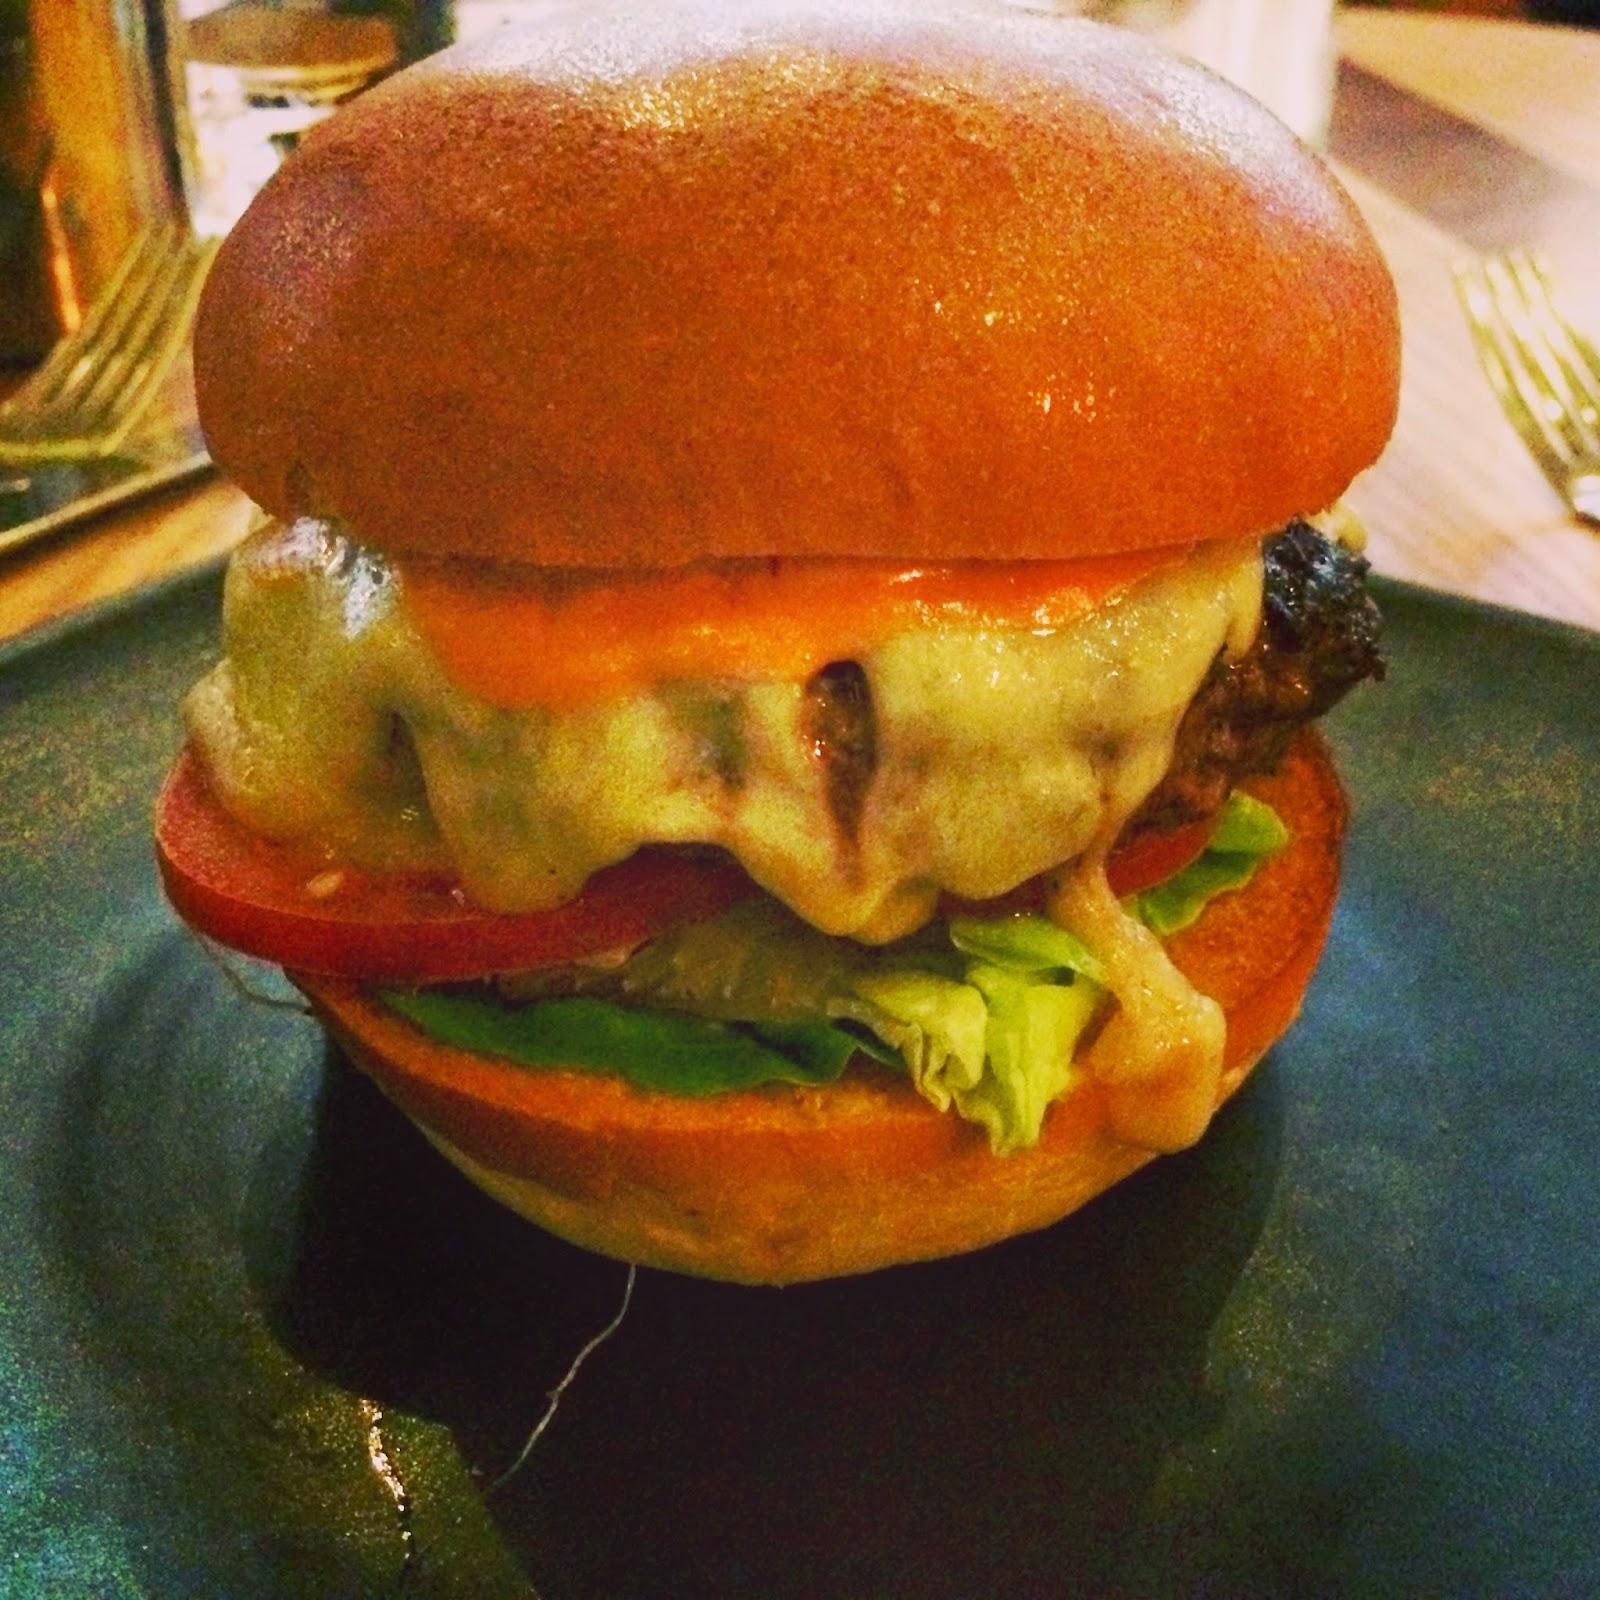 Bread Street Kitchen burger - short rib beef, Monterey Jack cheese, spicy sriracha mayo